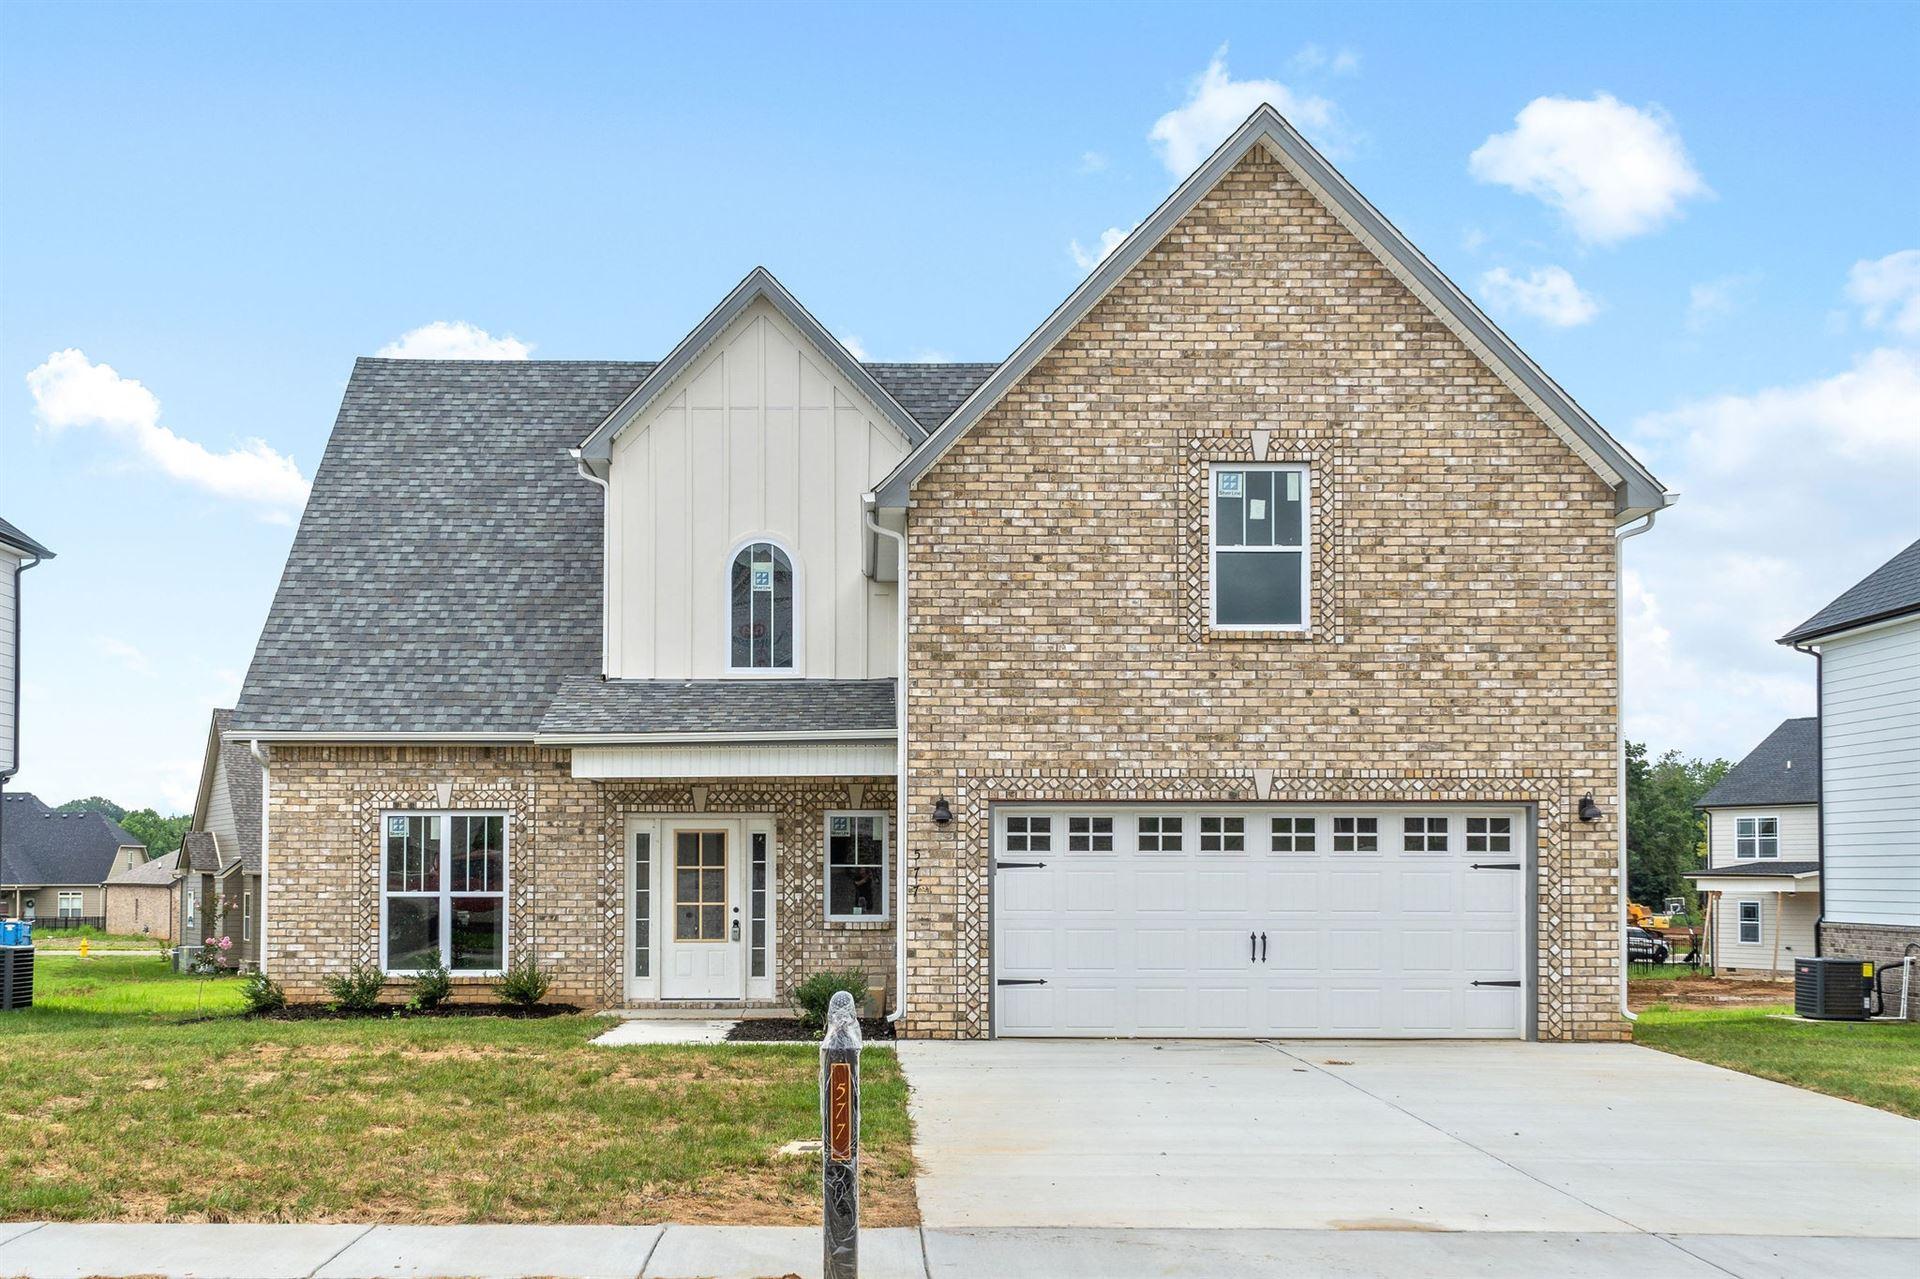 577 Dexter Drive, Clarksville, TN 37043 - MLS#: 2287682